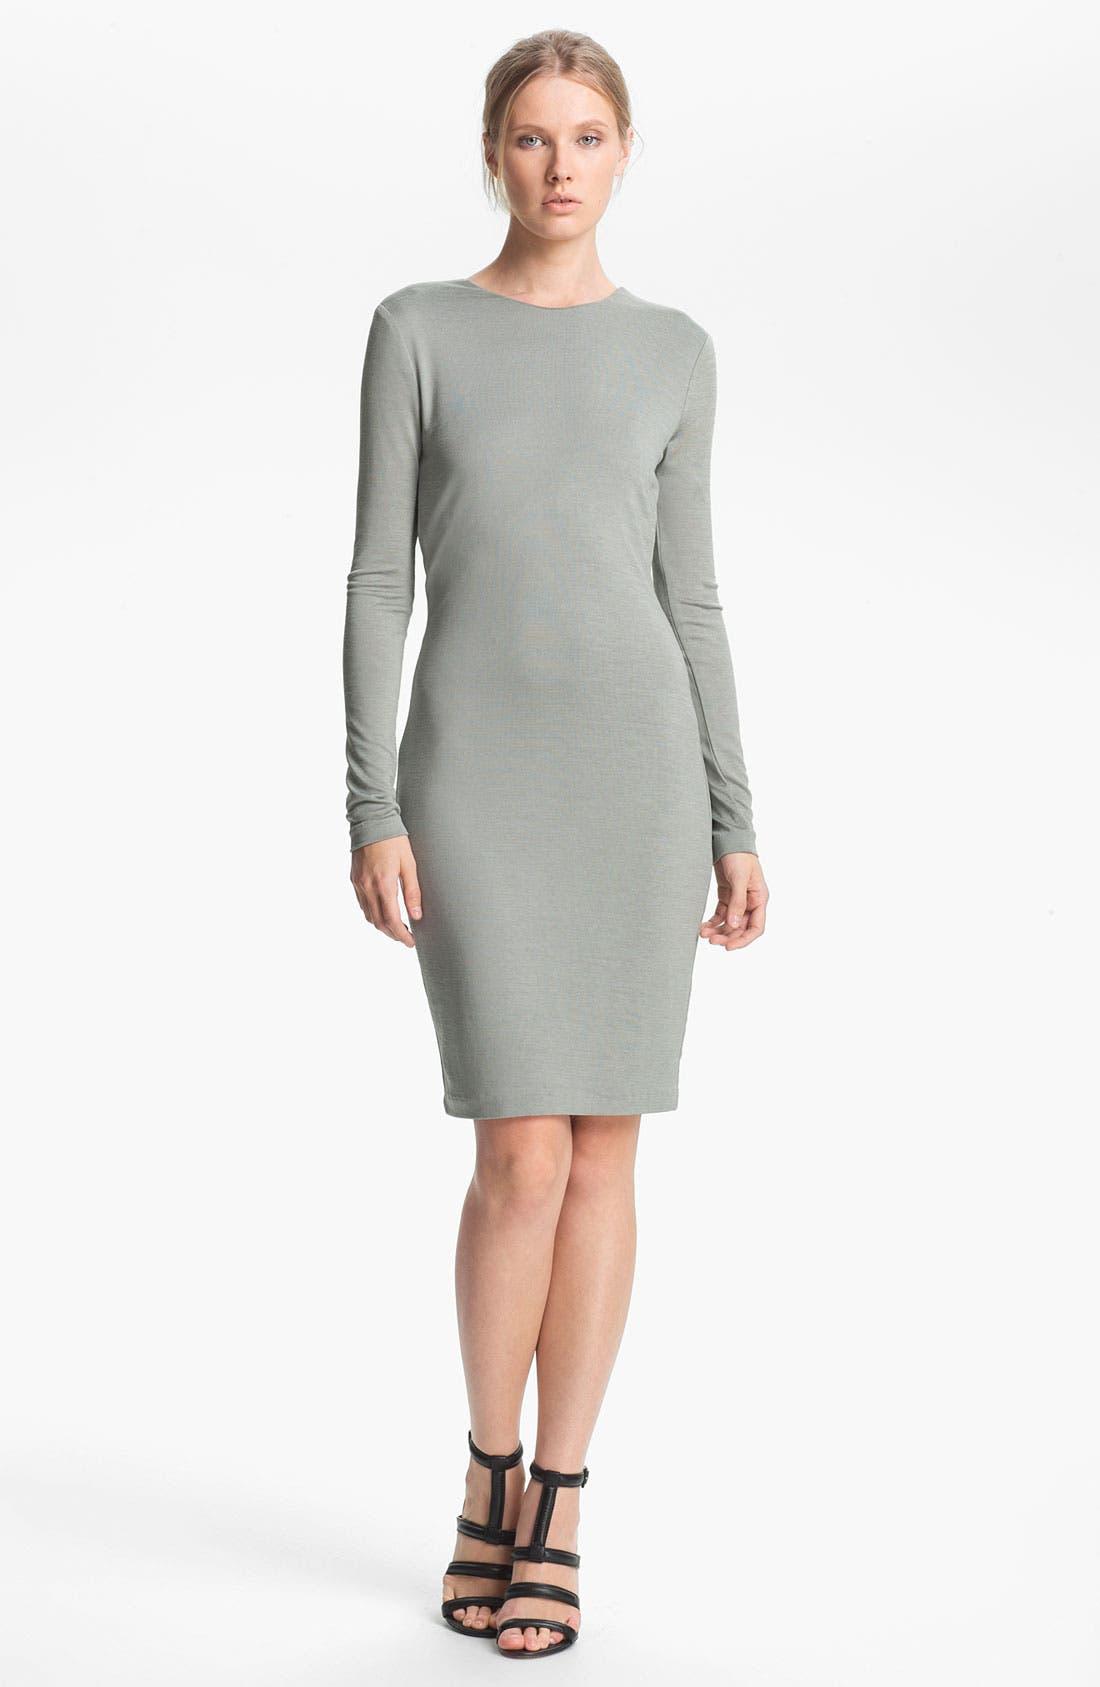 Alternate Image 1 Selected - T by Alexander Wang Drape Back Jersey Dress